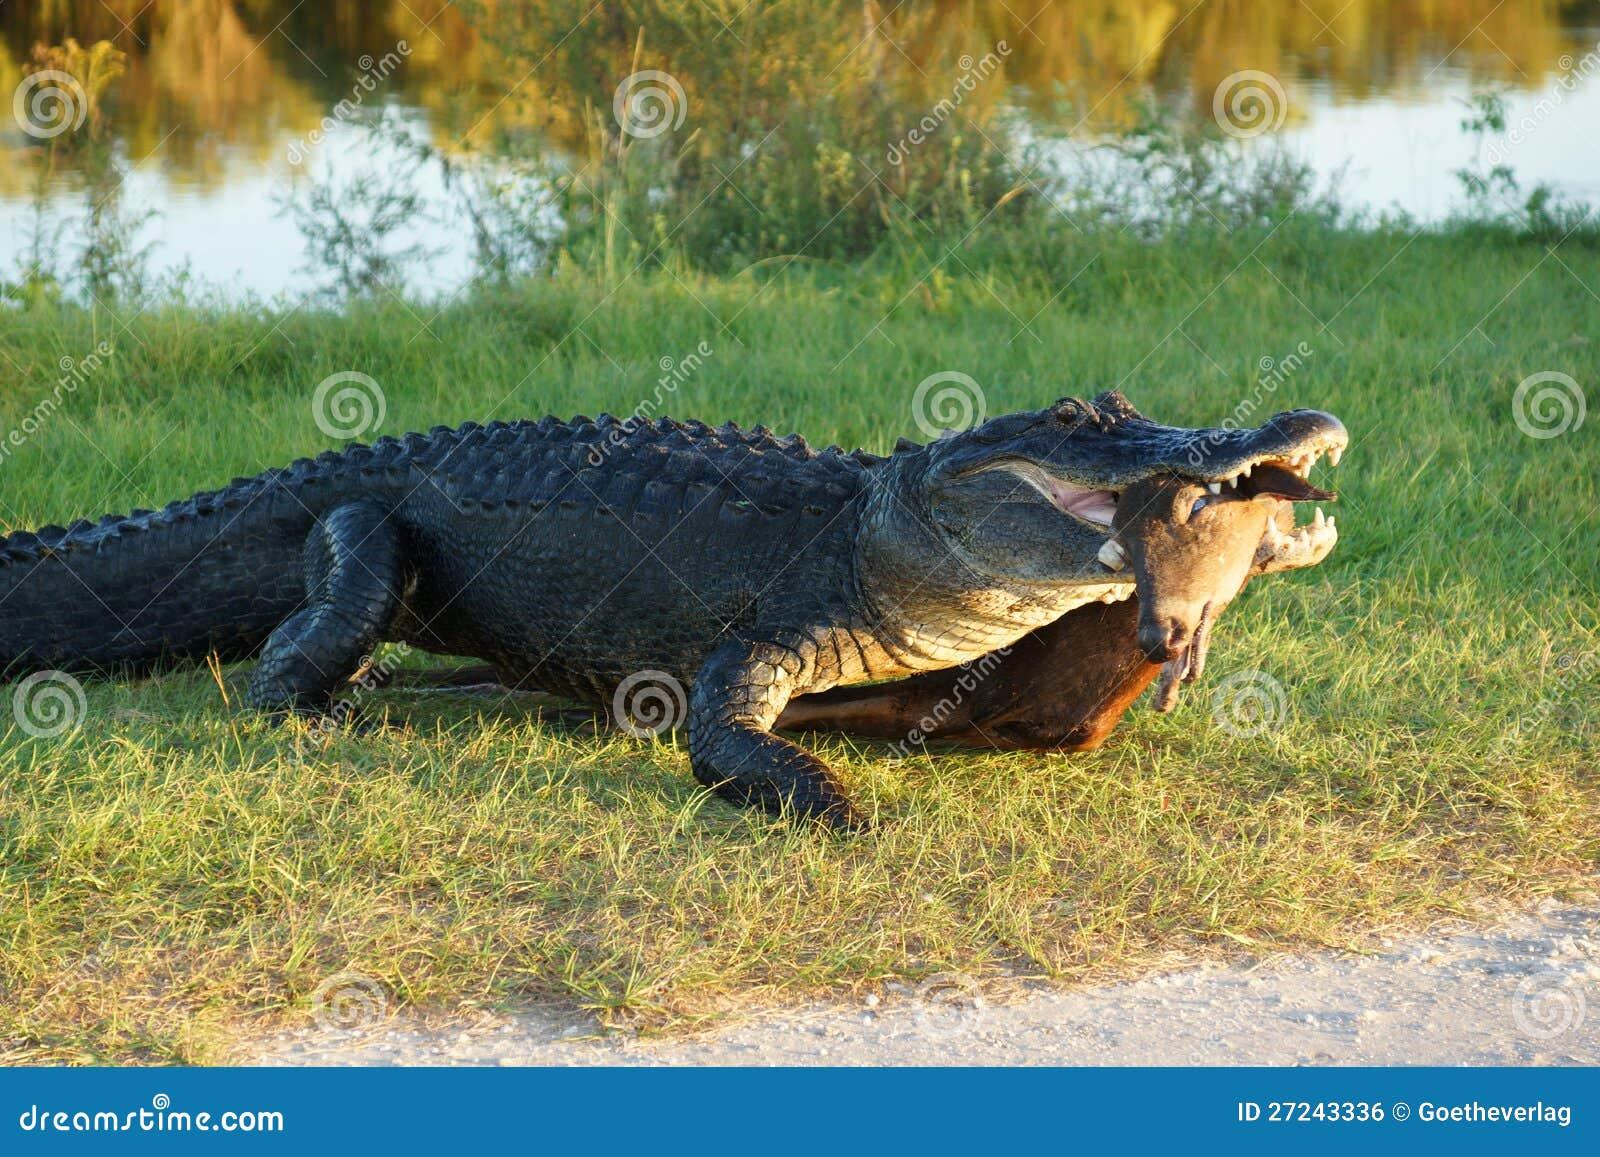 Аллигатор с животным prey